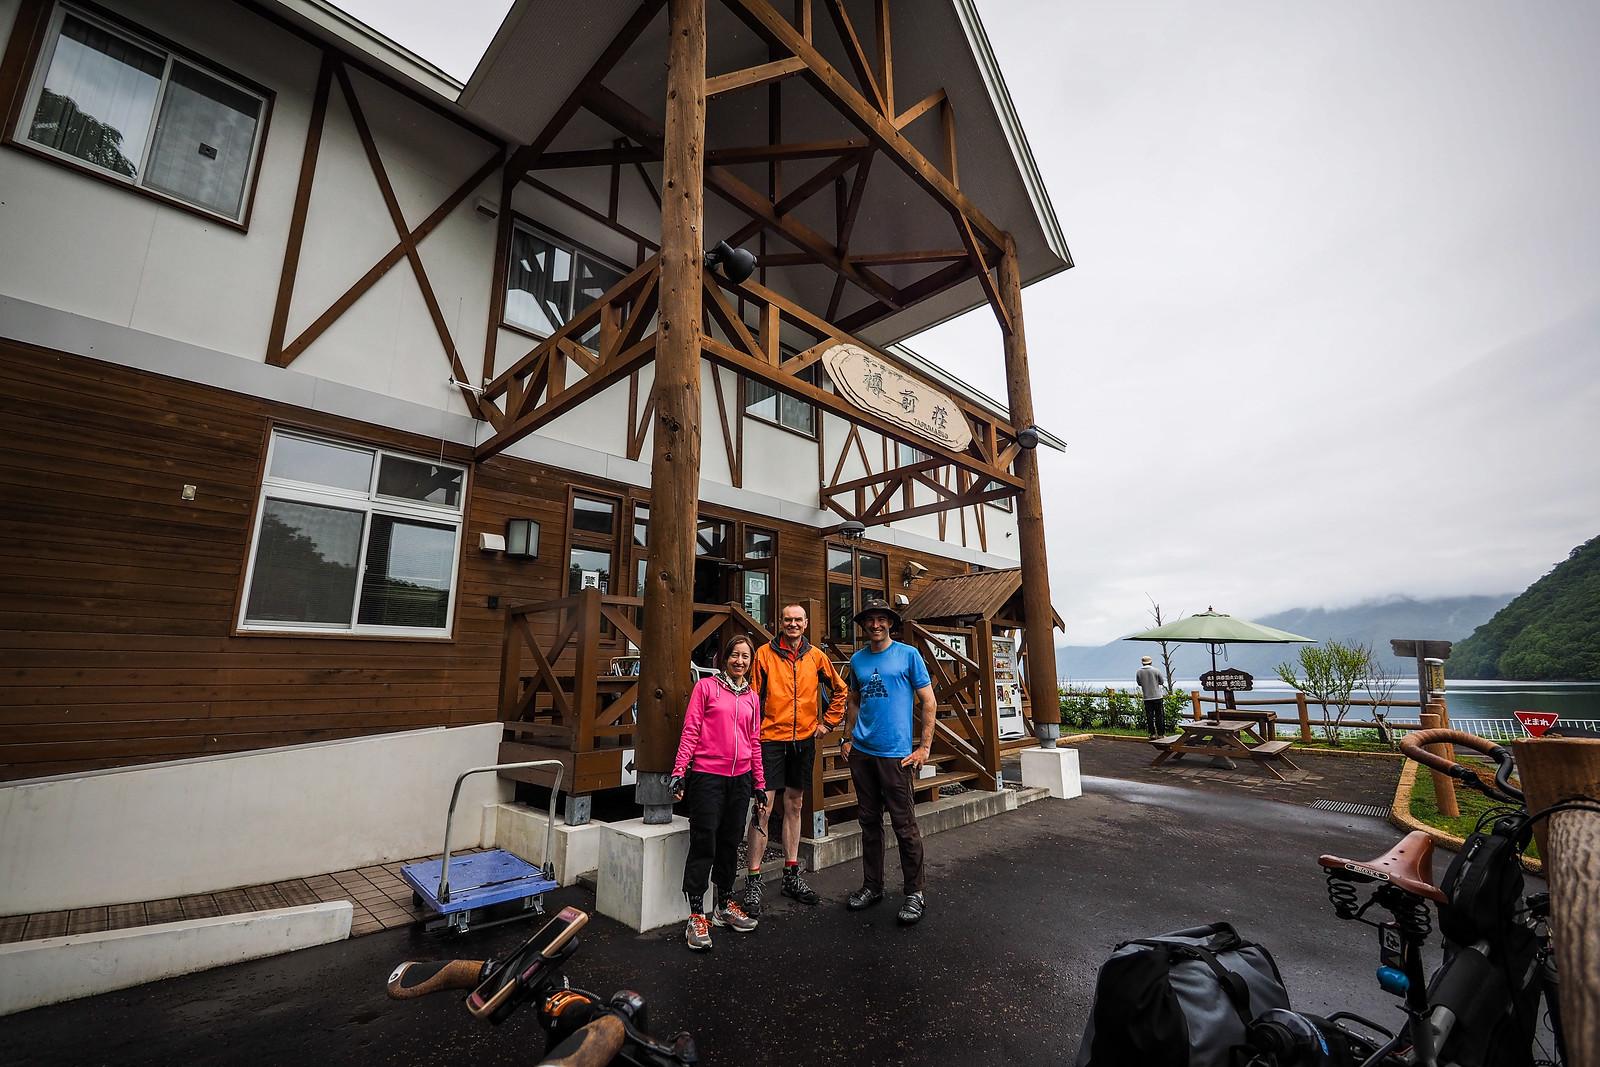 Tarumae-so Riders' House (Lake Shikotsu, Hokkaido, Japan)